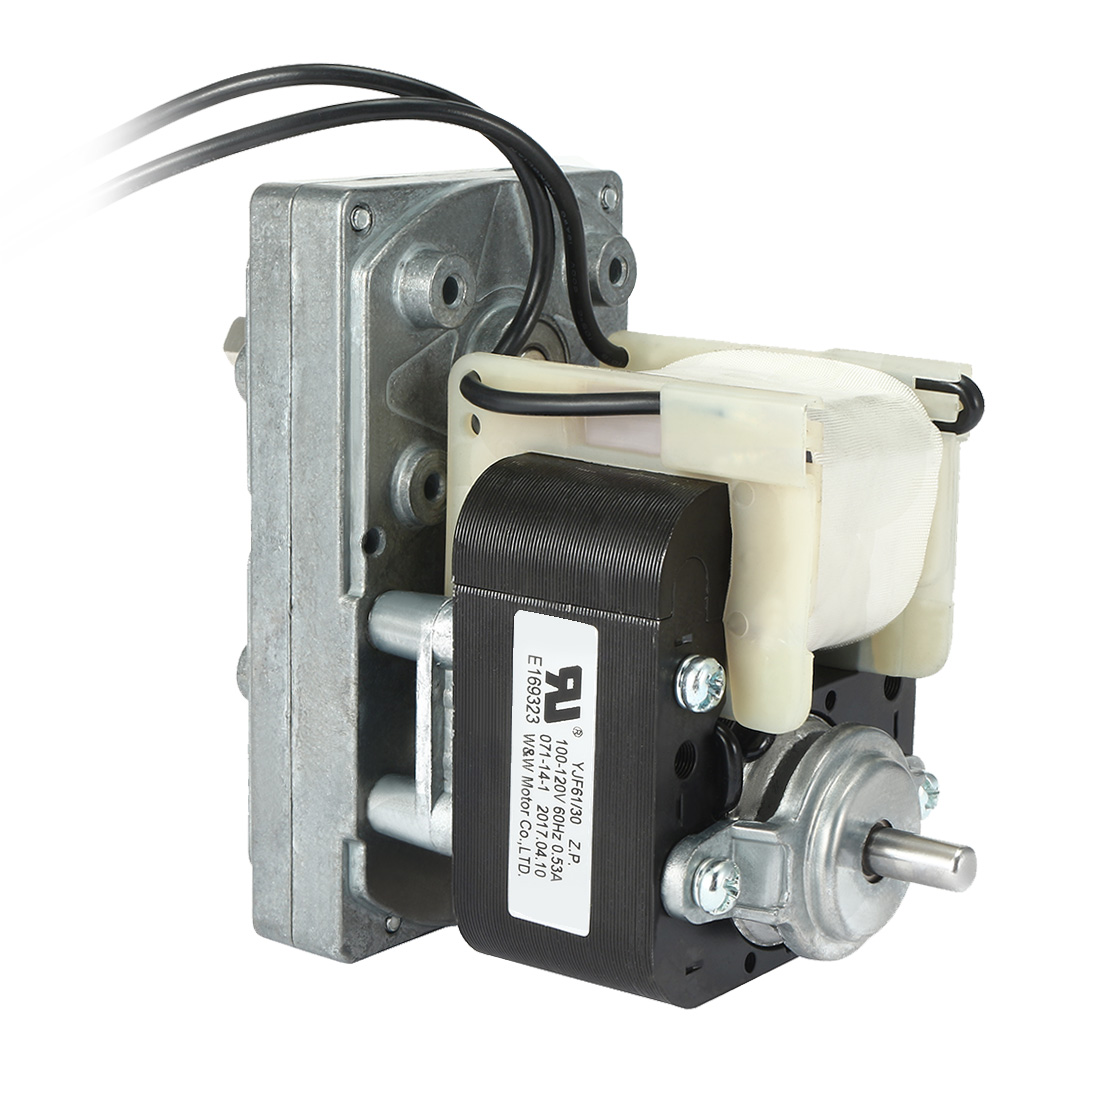 FC-YJ61 AC100V-120V 60Hz 9.5RPM CW Shaded Pole Motor Universal Geared Motor